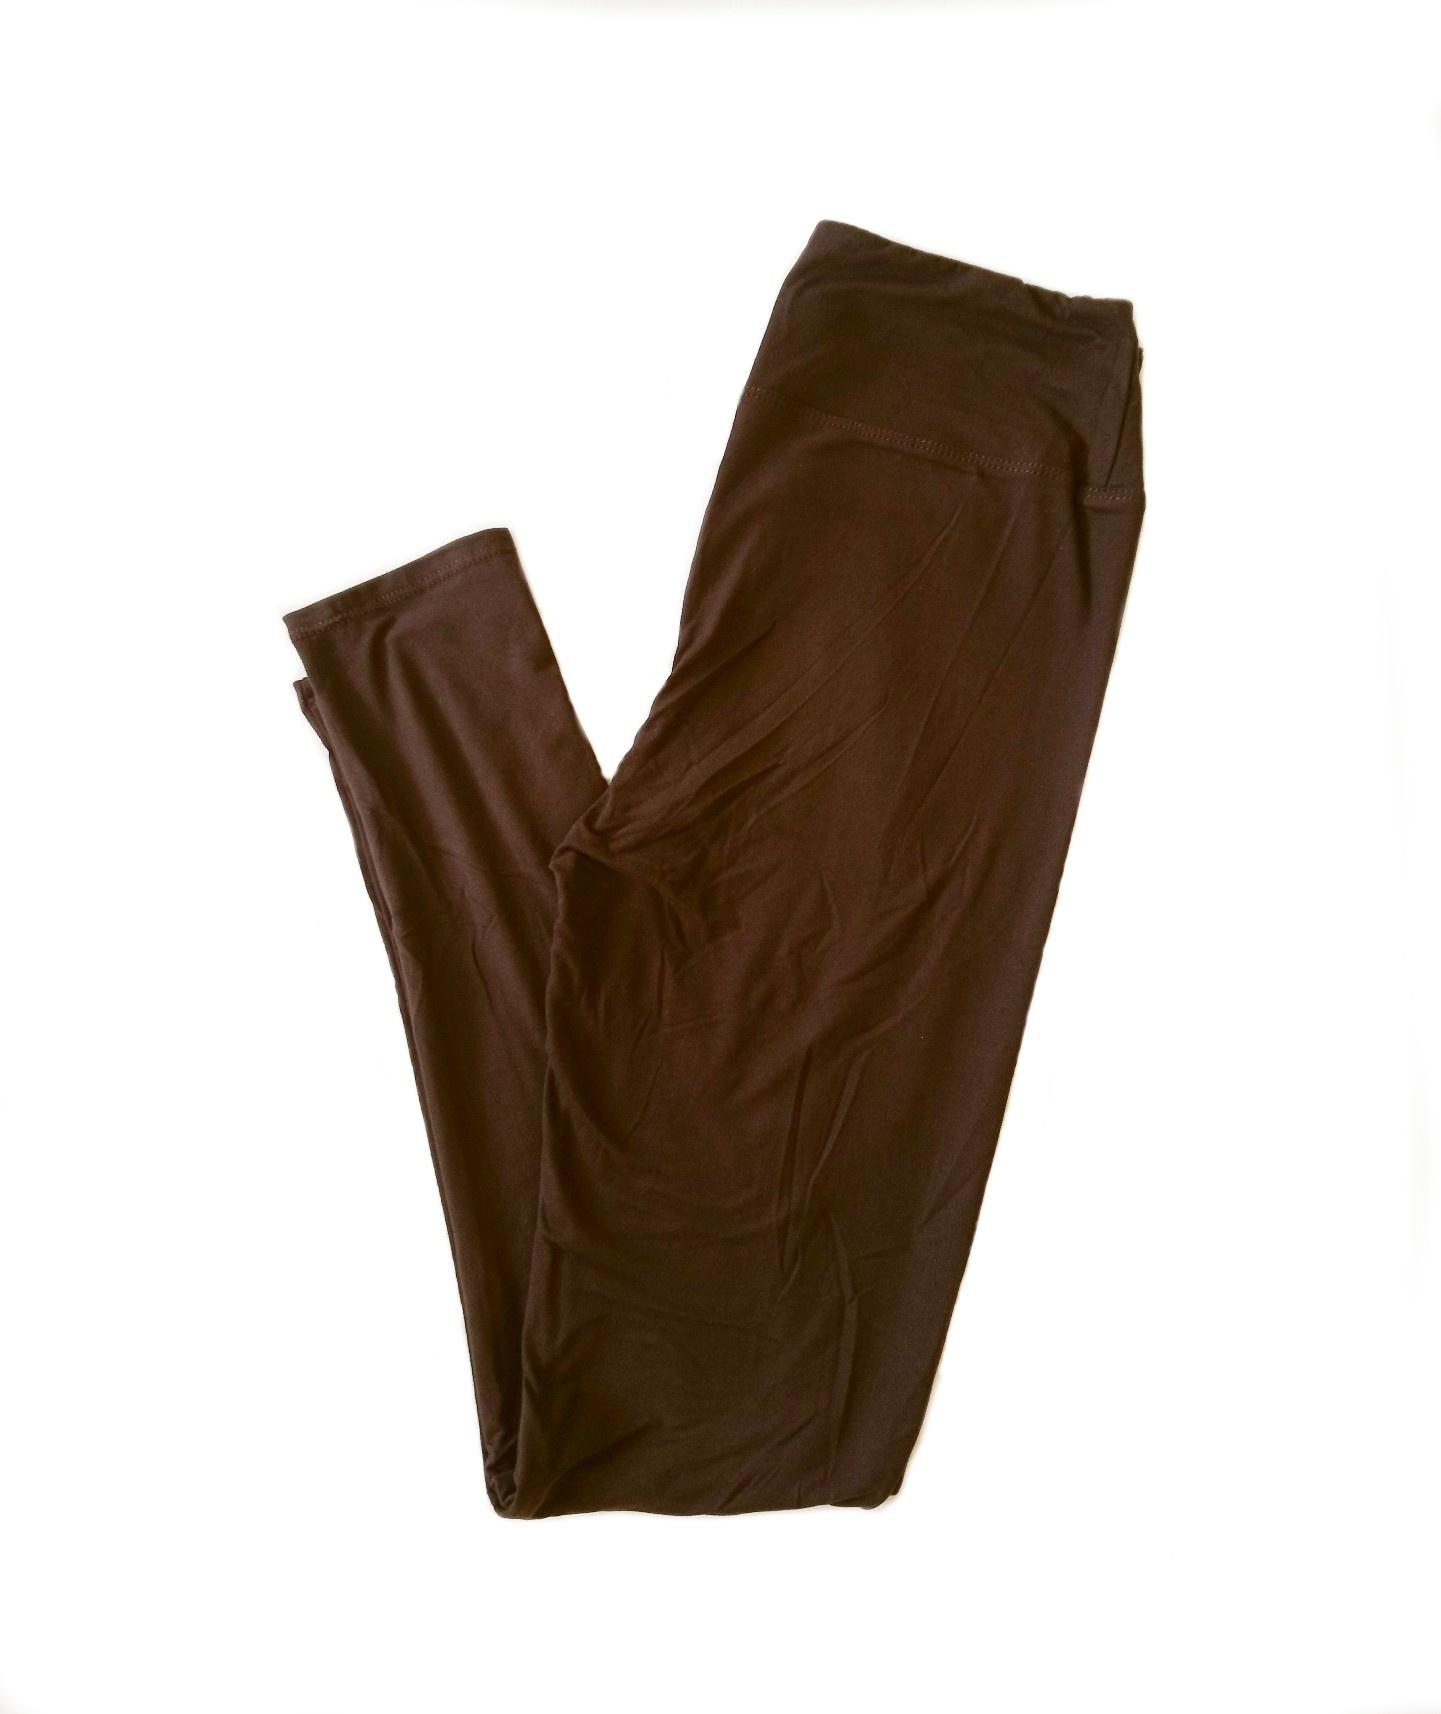 Solid Brown Yoga Band Legging